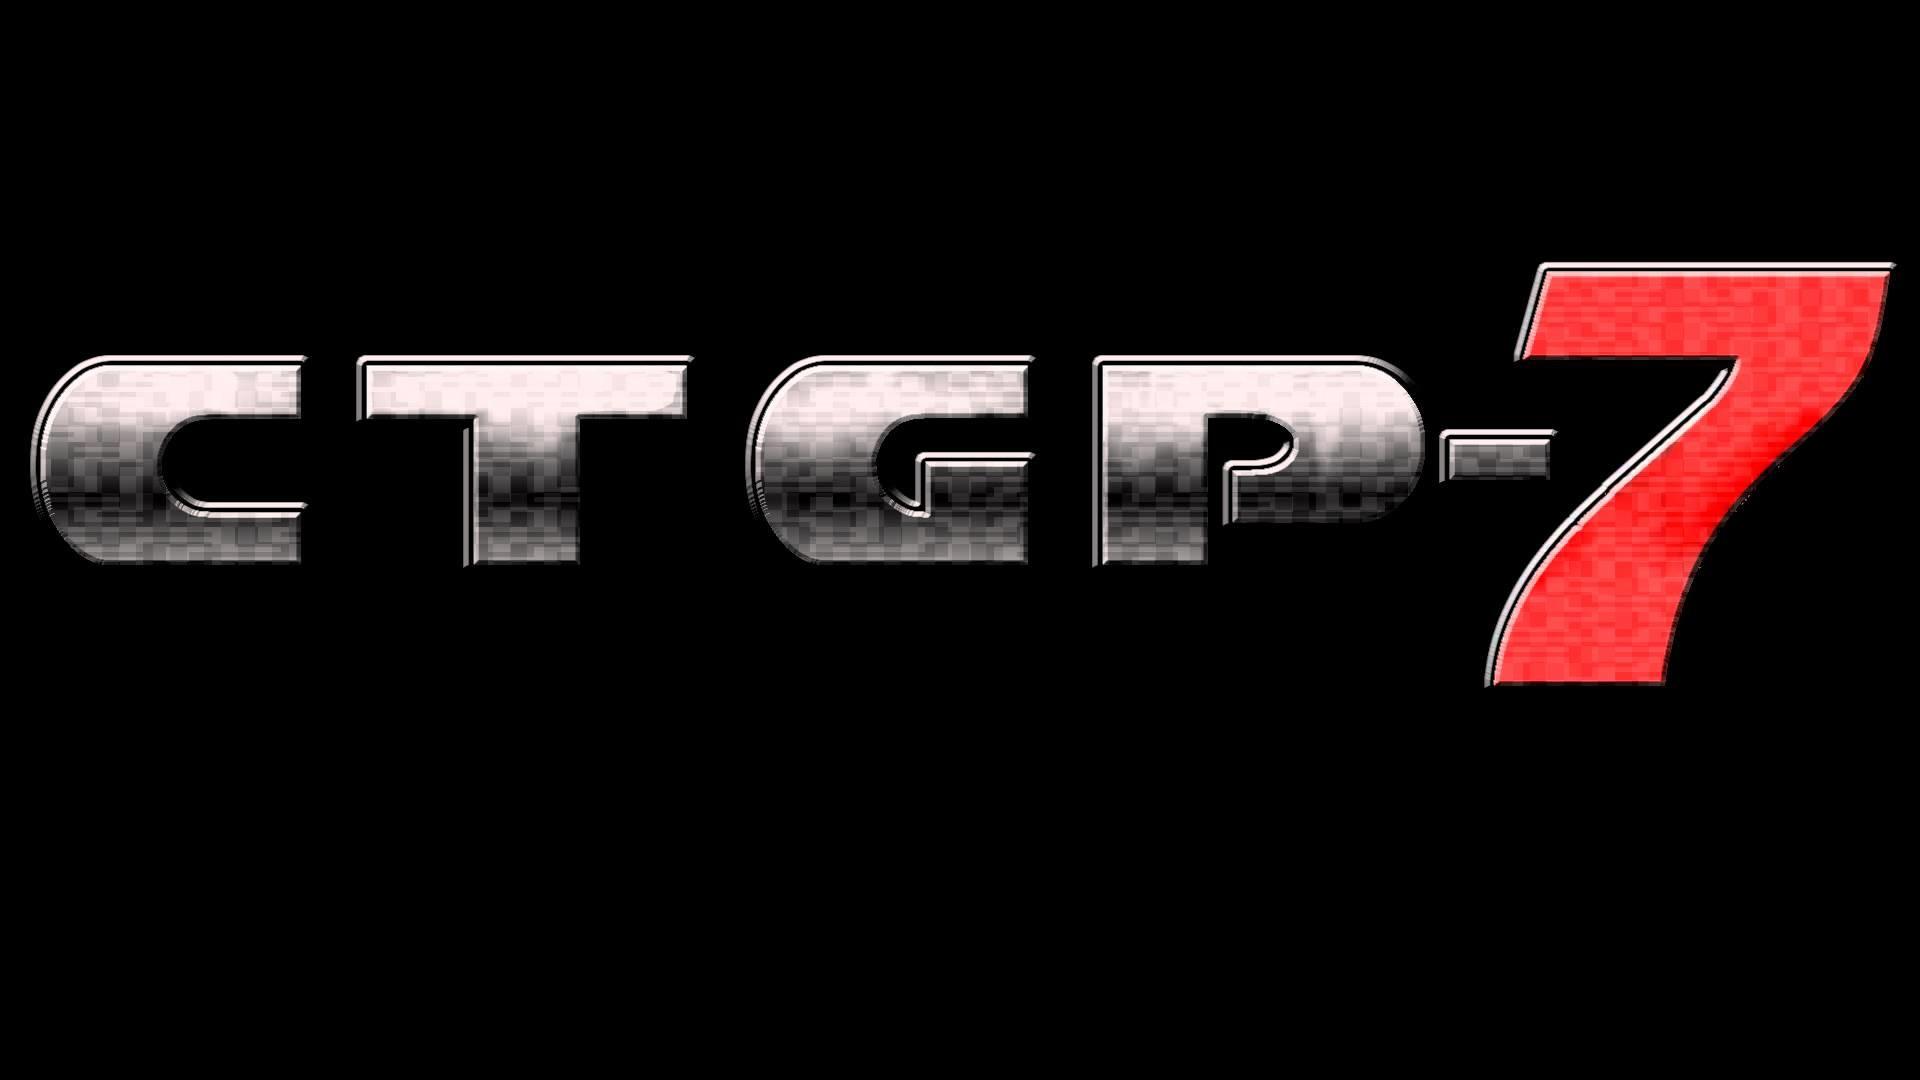 CTGP-7 Cia Download